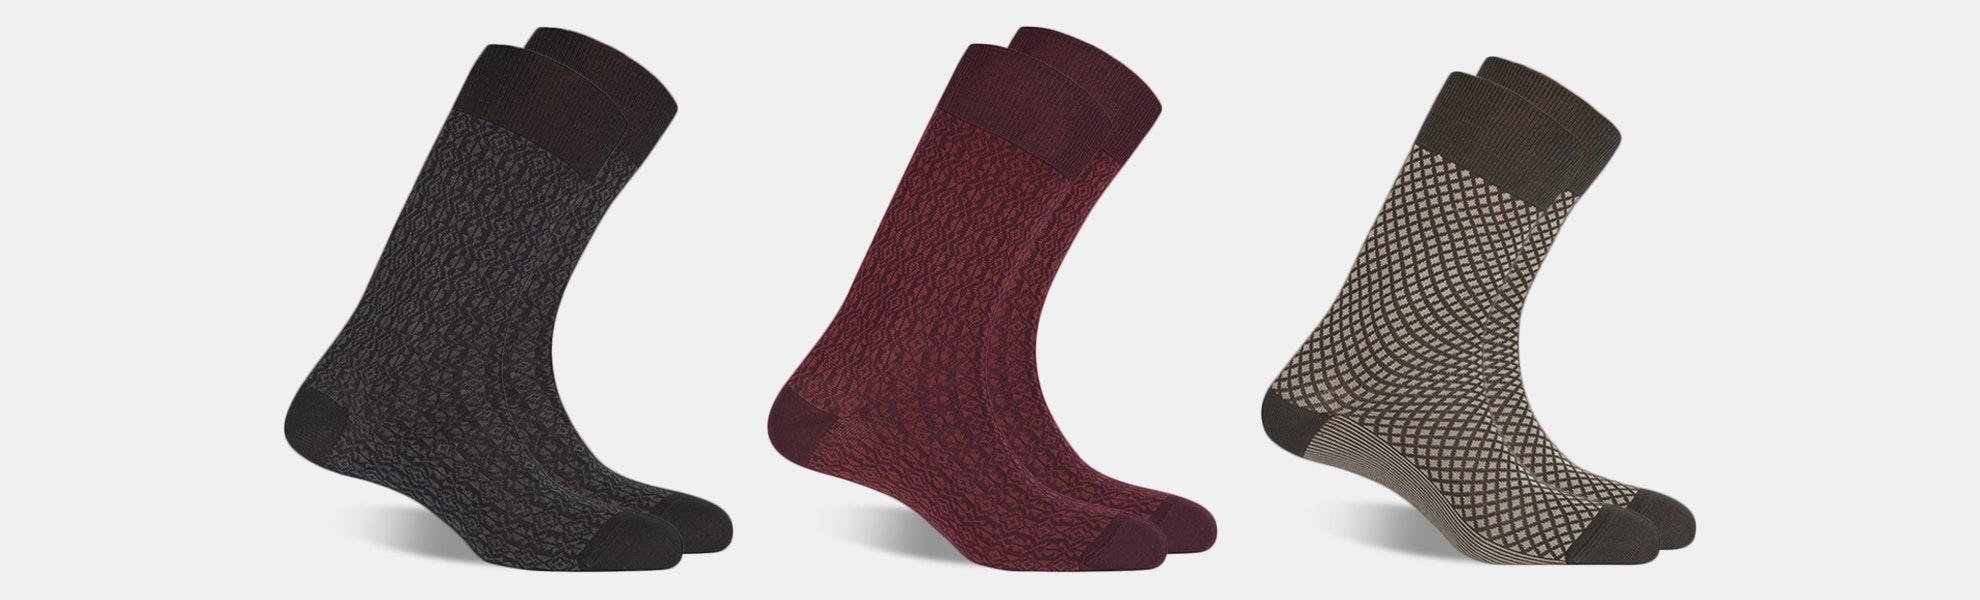 Punto Blanco Cotton Blend Socks (3-Pack)